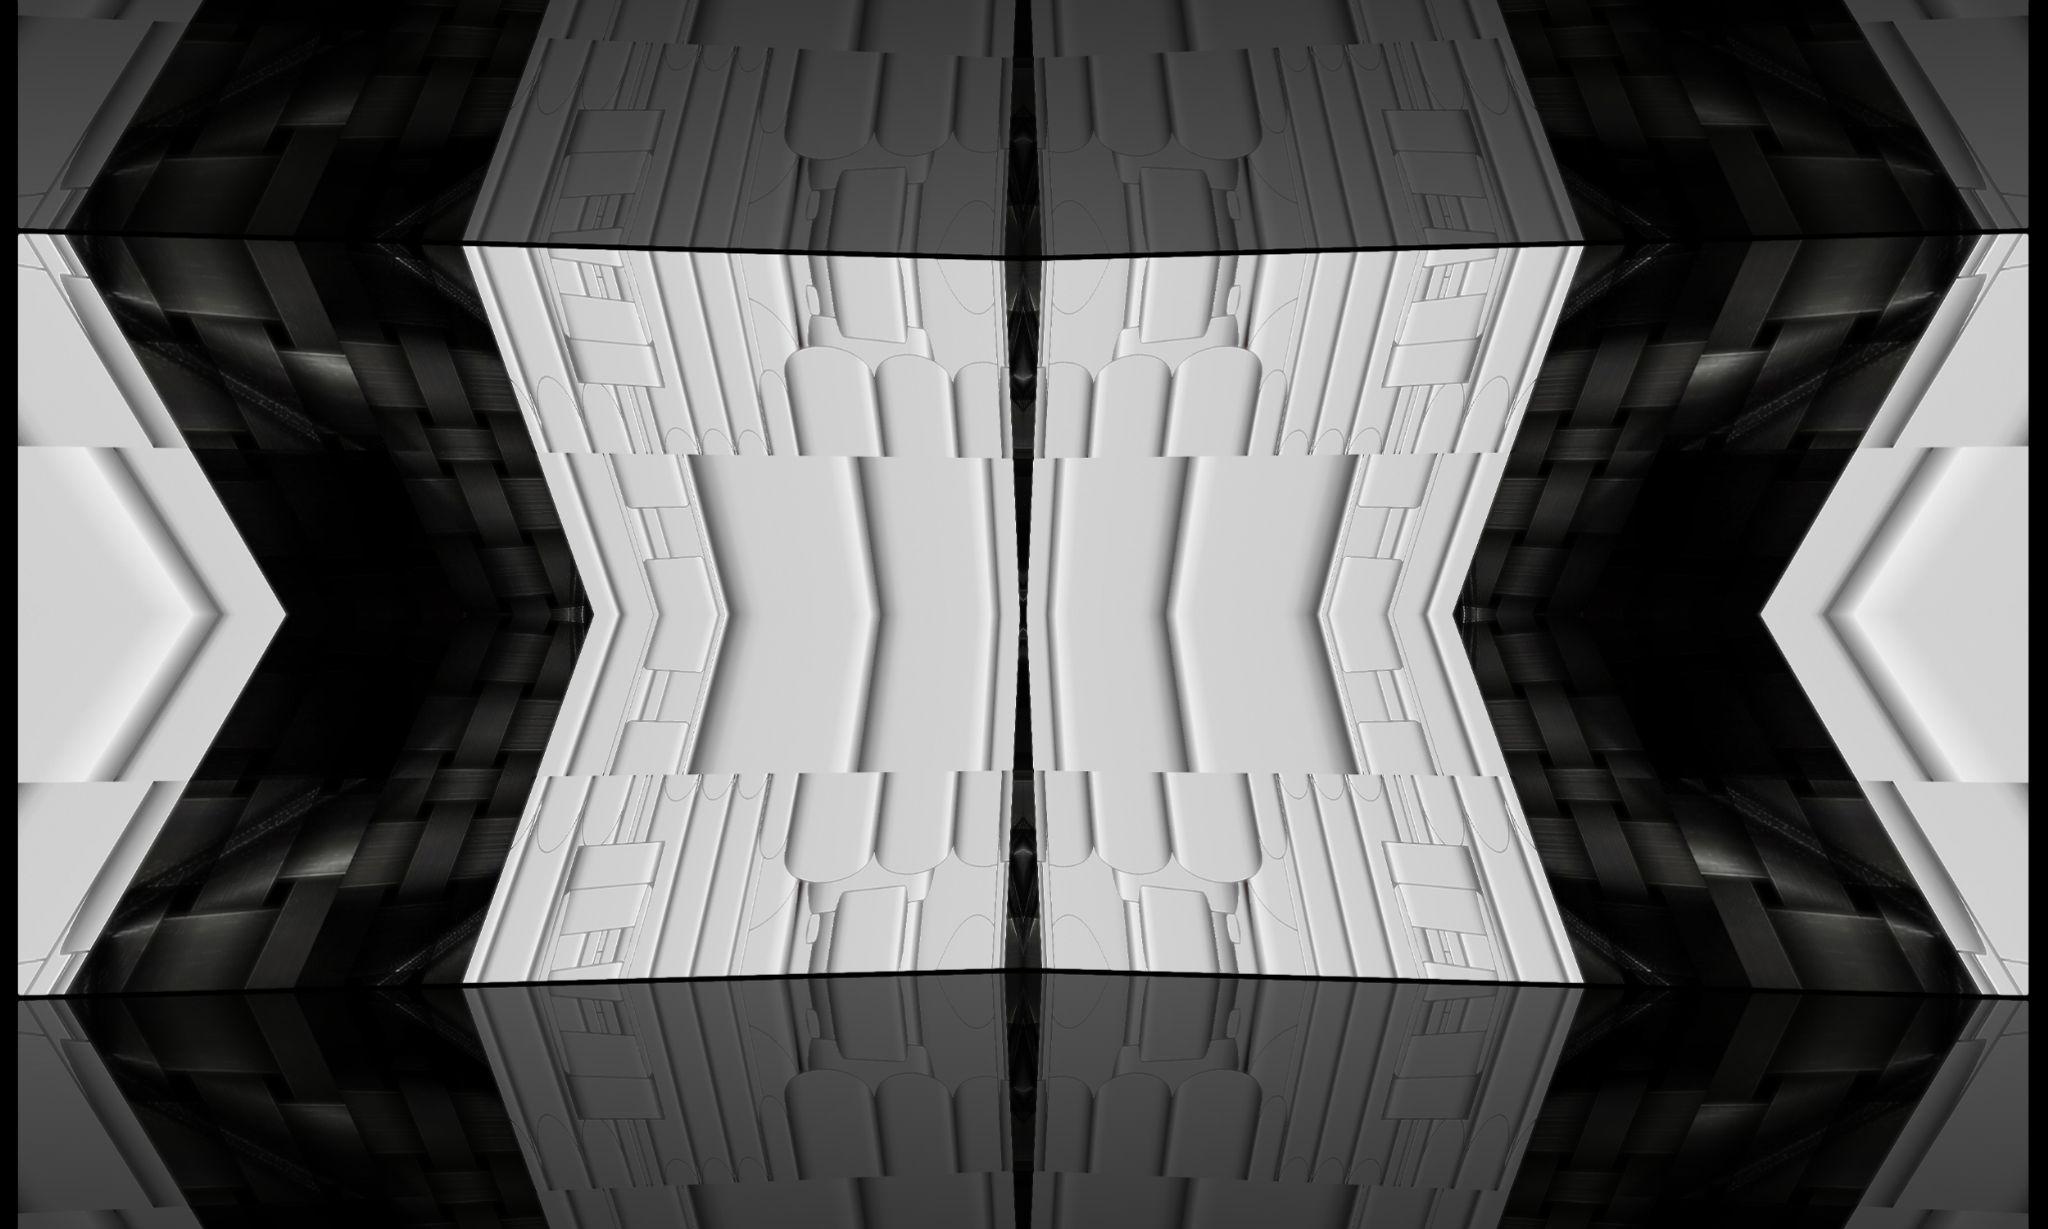 metal floor plan metal weave overlay old back ground WORLD by AngeliqueH